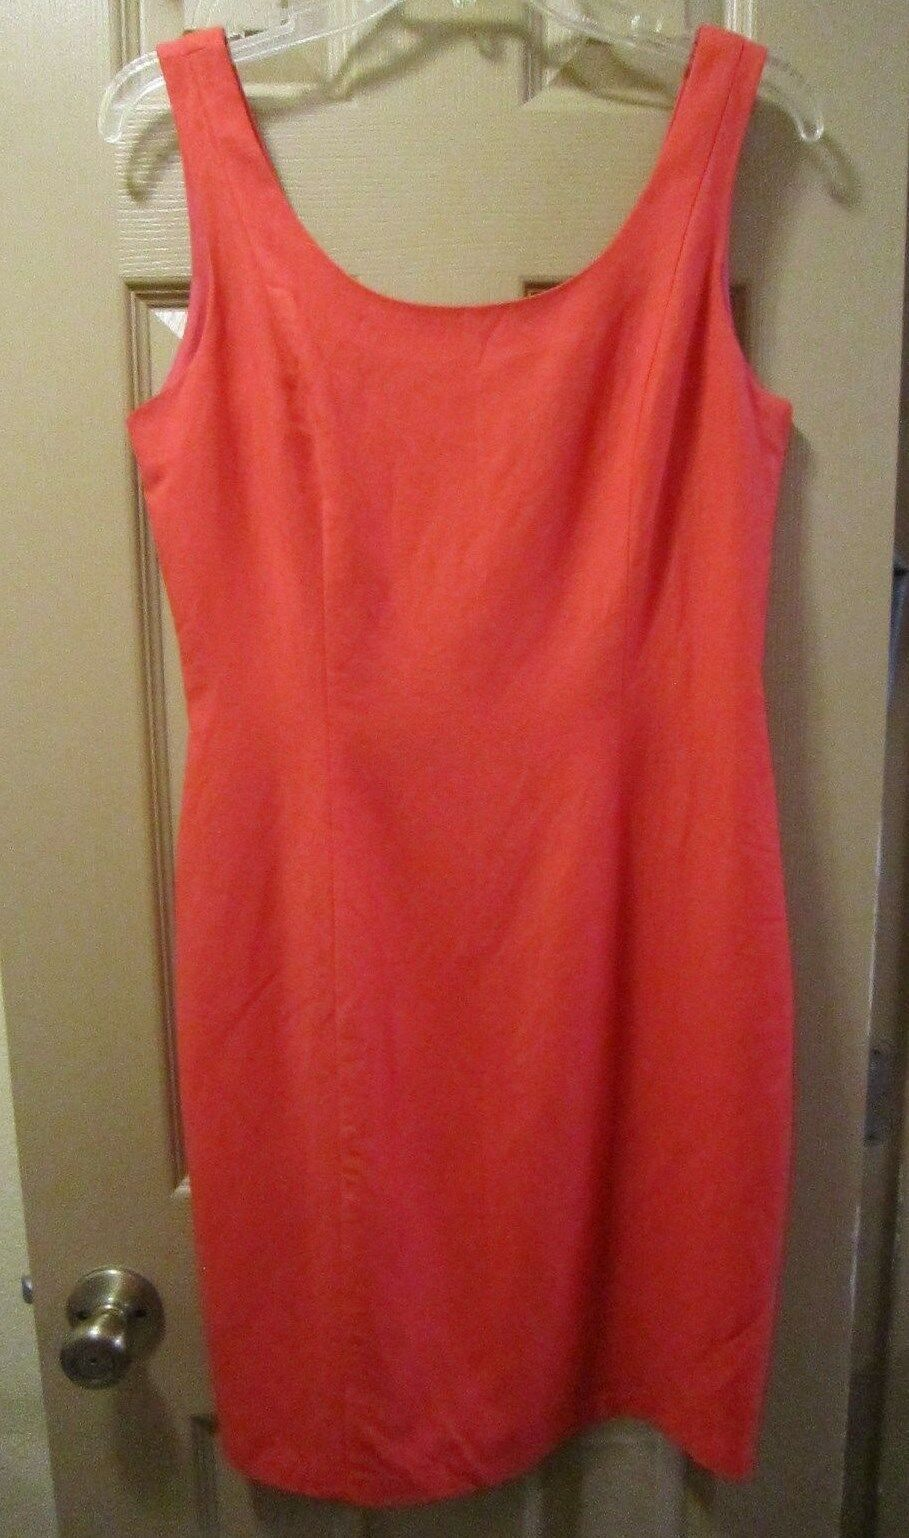 SZ 6 NEW YORK STUDIO WOMENS ORANGE PINK CORAL LINEN BLEND SHEATH STYLE DRESS EUC